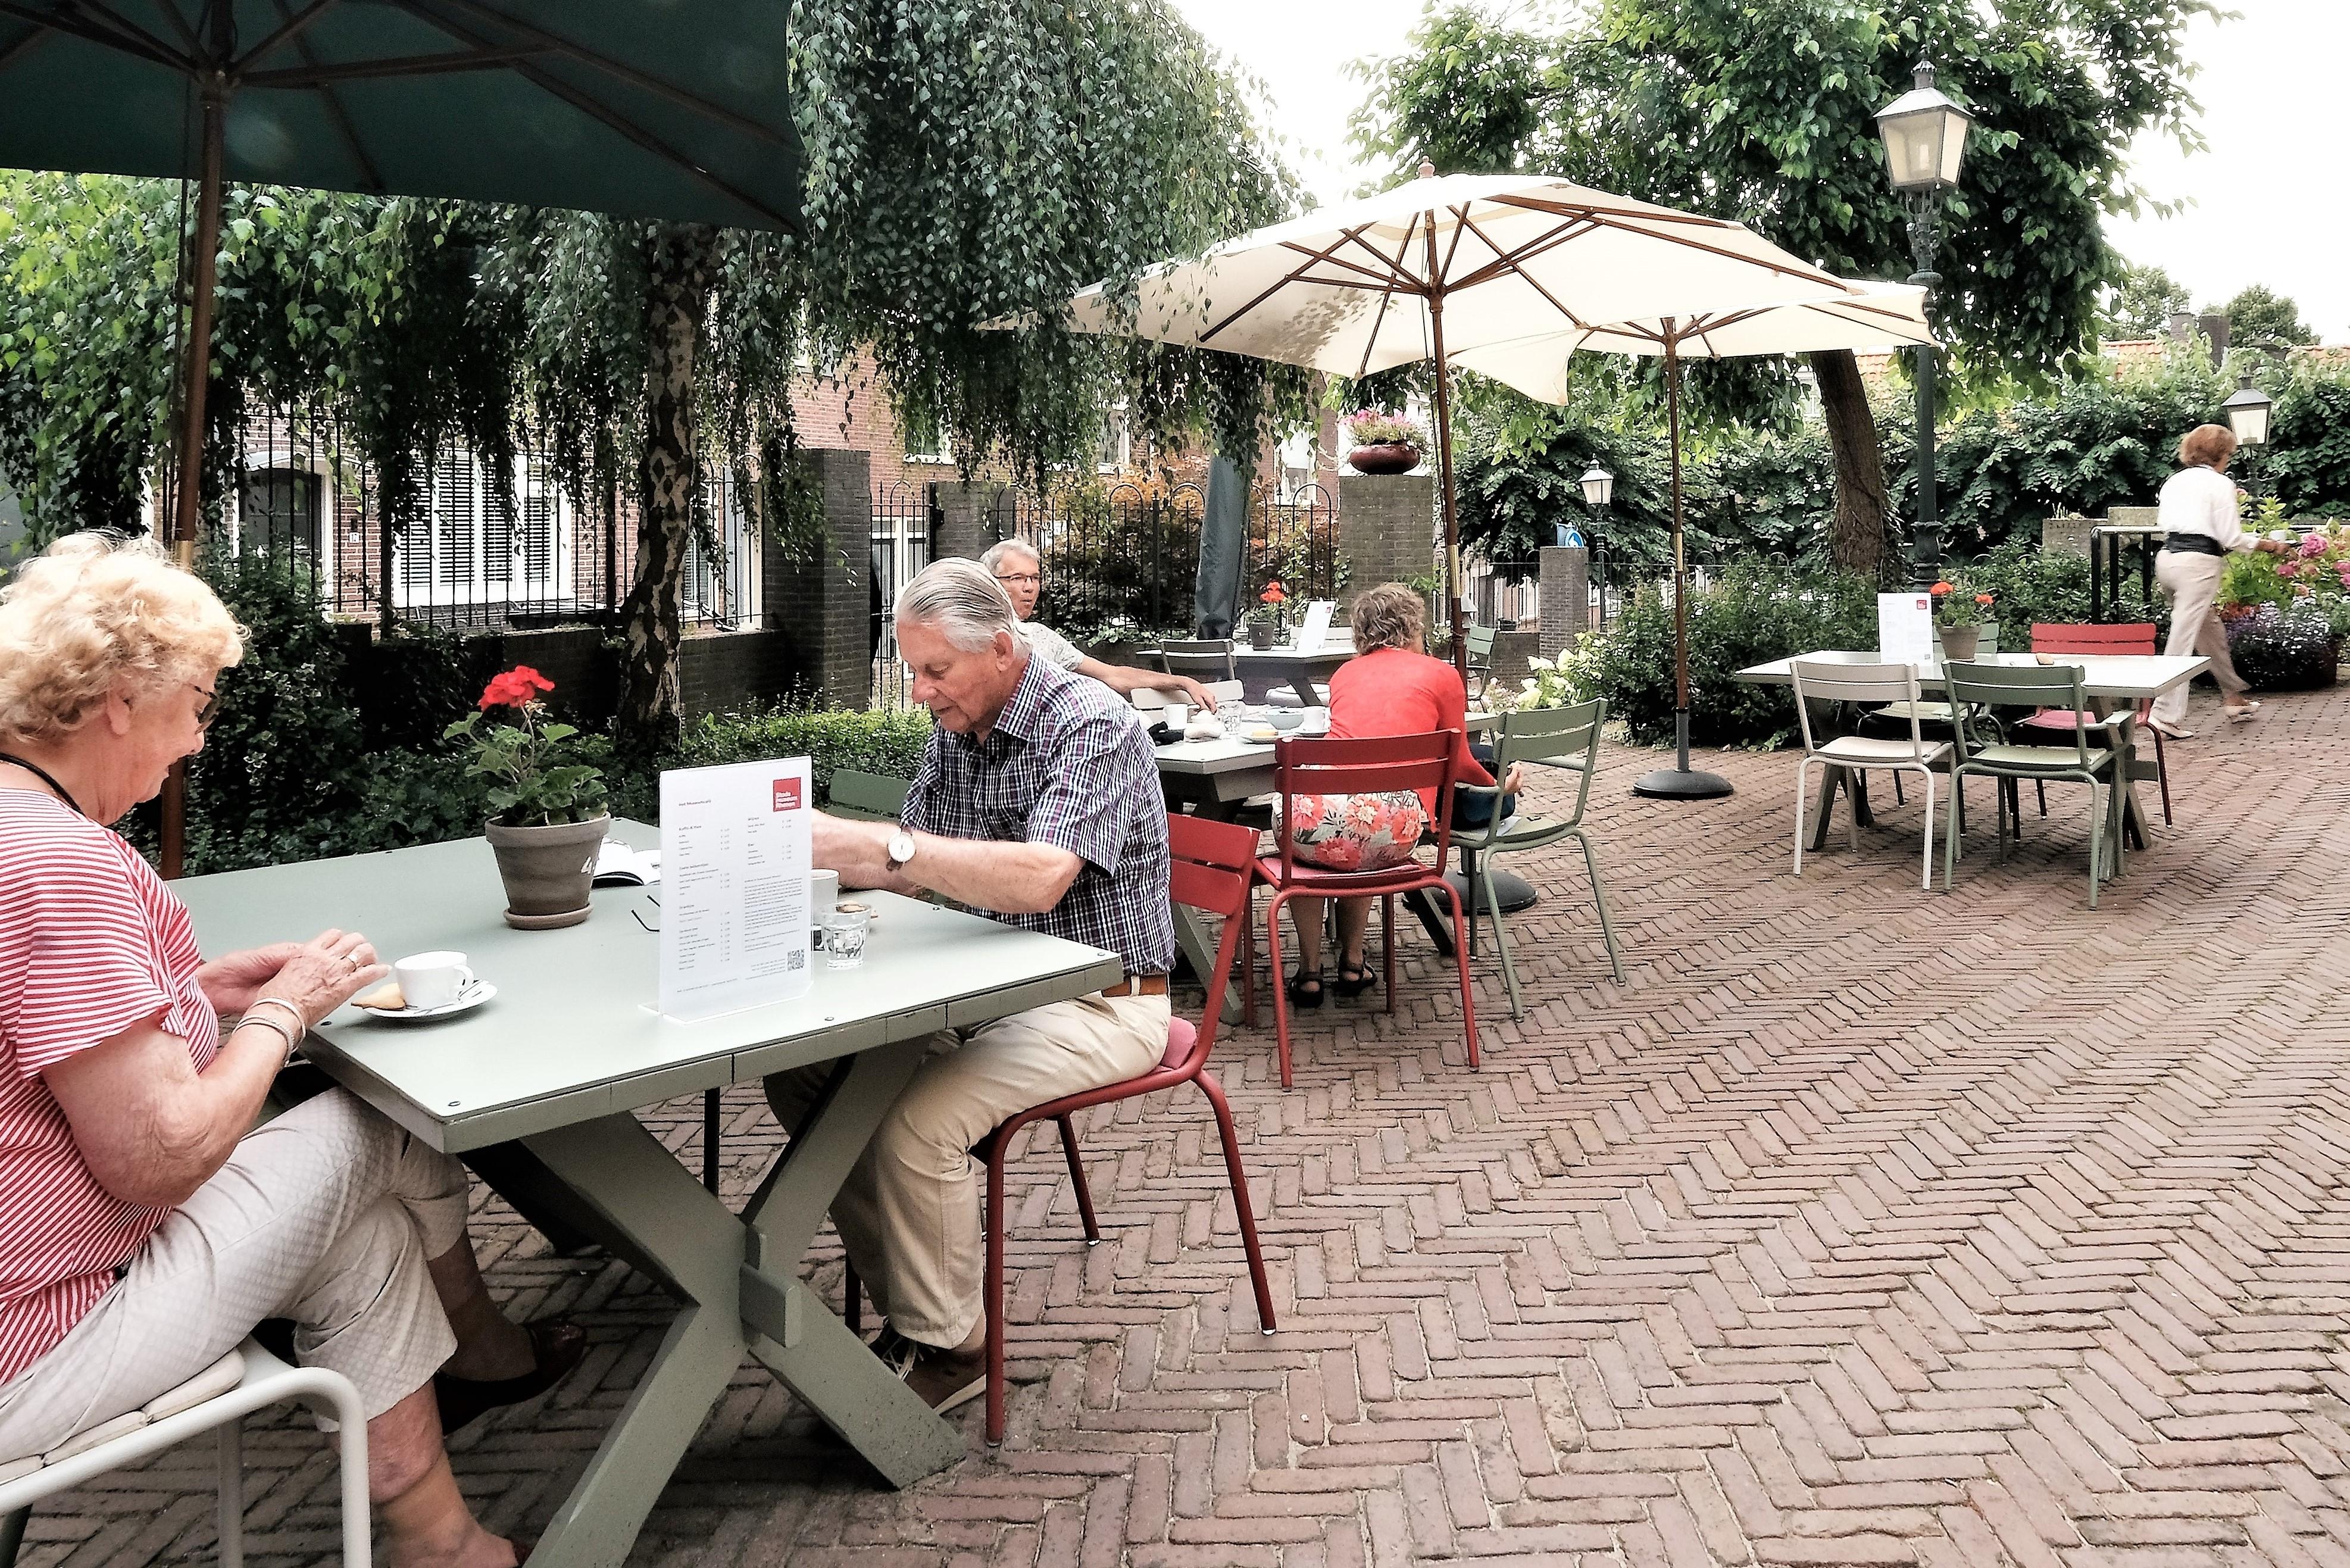 JvdB museumgasten met koffie 1 foto Jan van den Brink knip